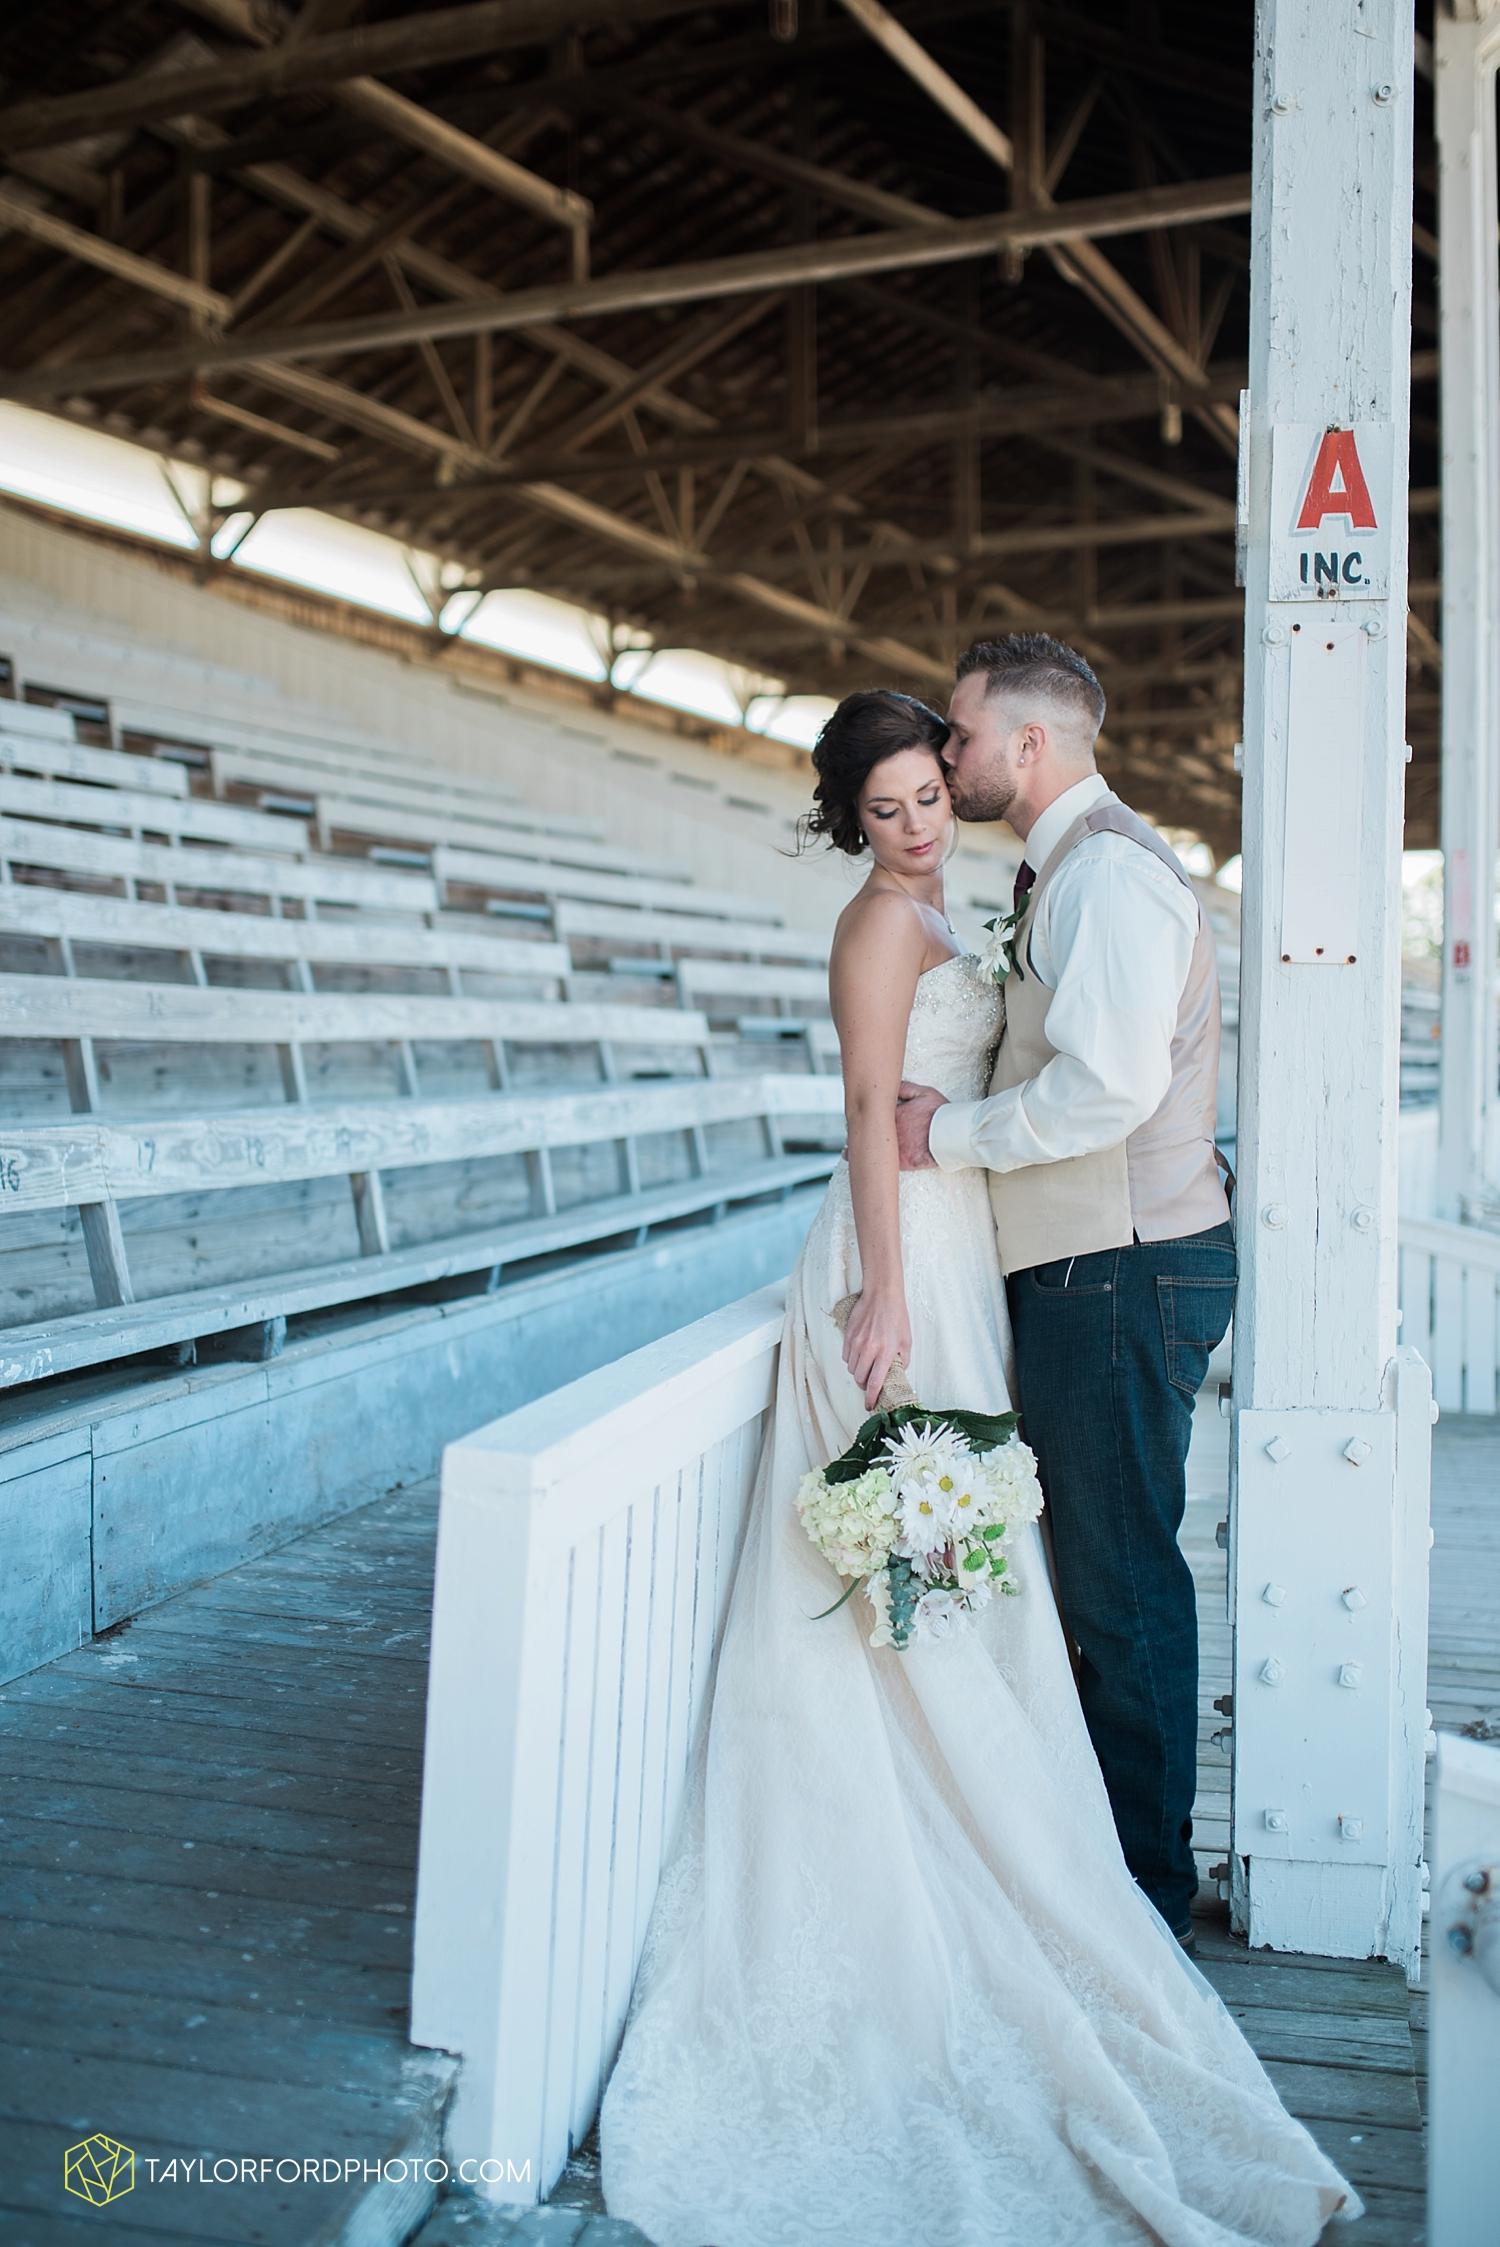 van_wert_ohio_dairy_barn_fairgrounds_fort_wayne_indiana_wedding_photographer_taylor_ford_3271.jpg